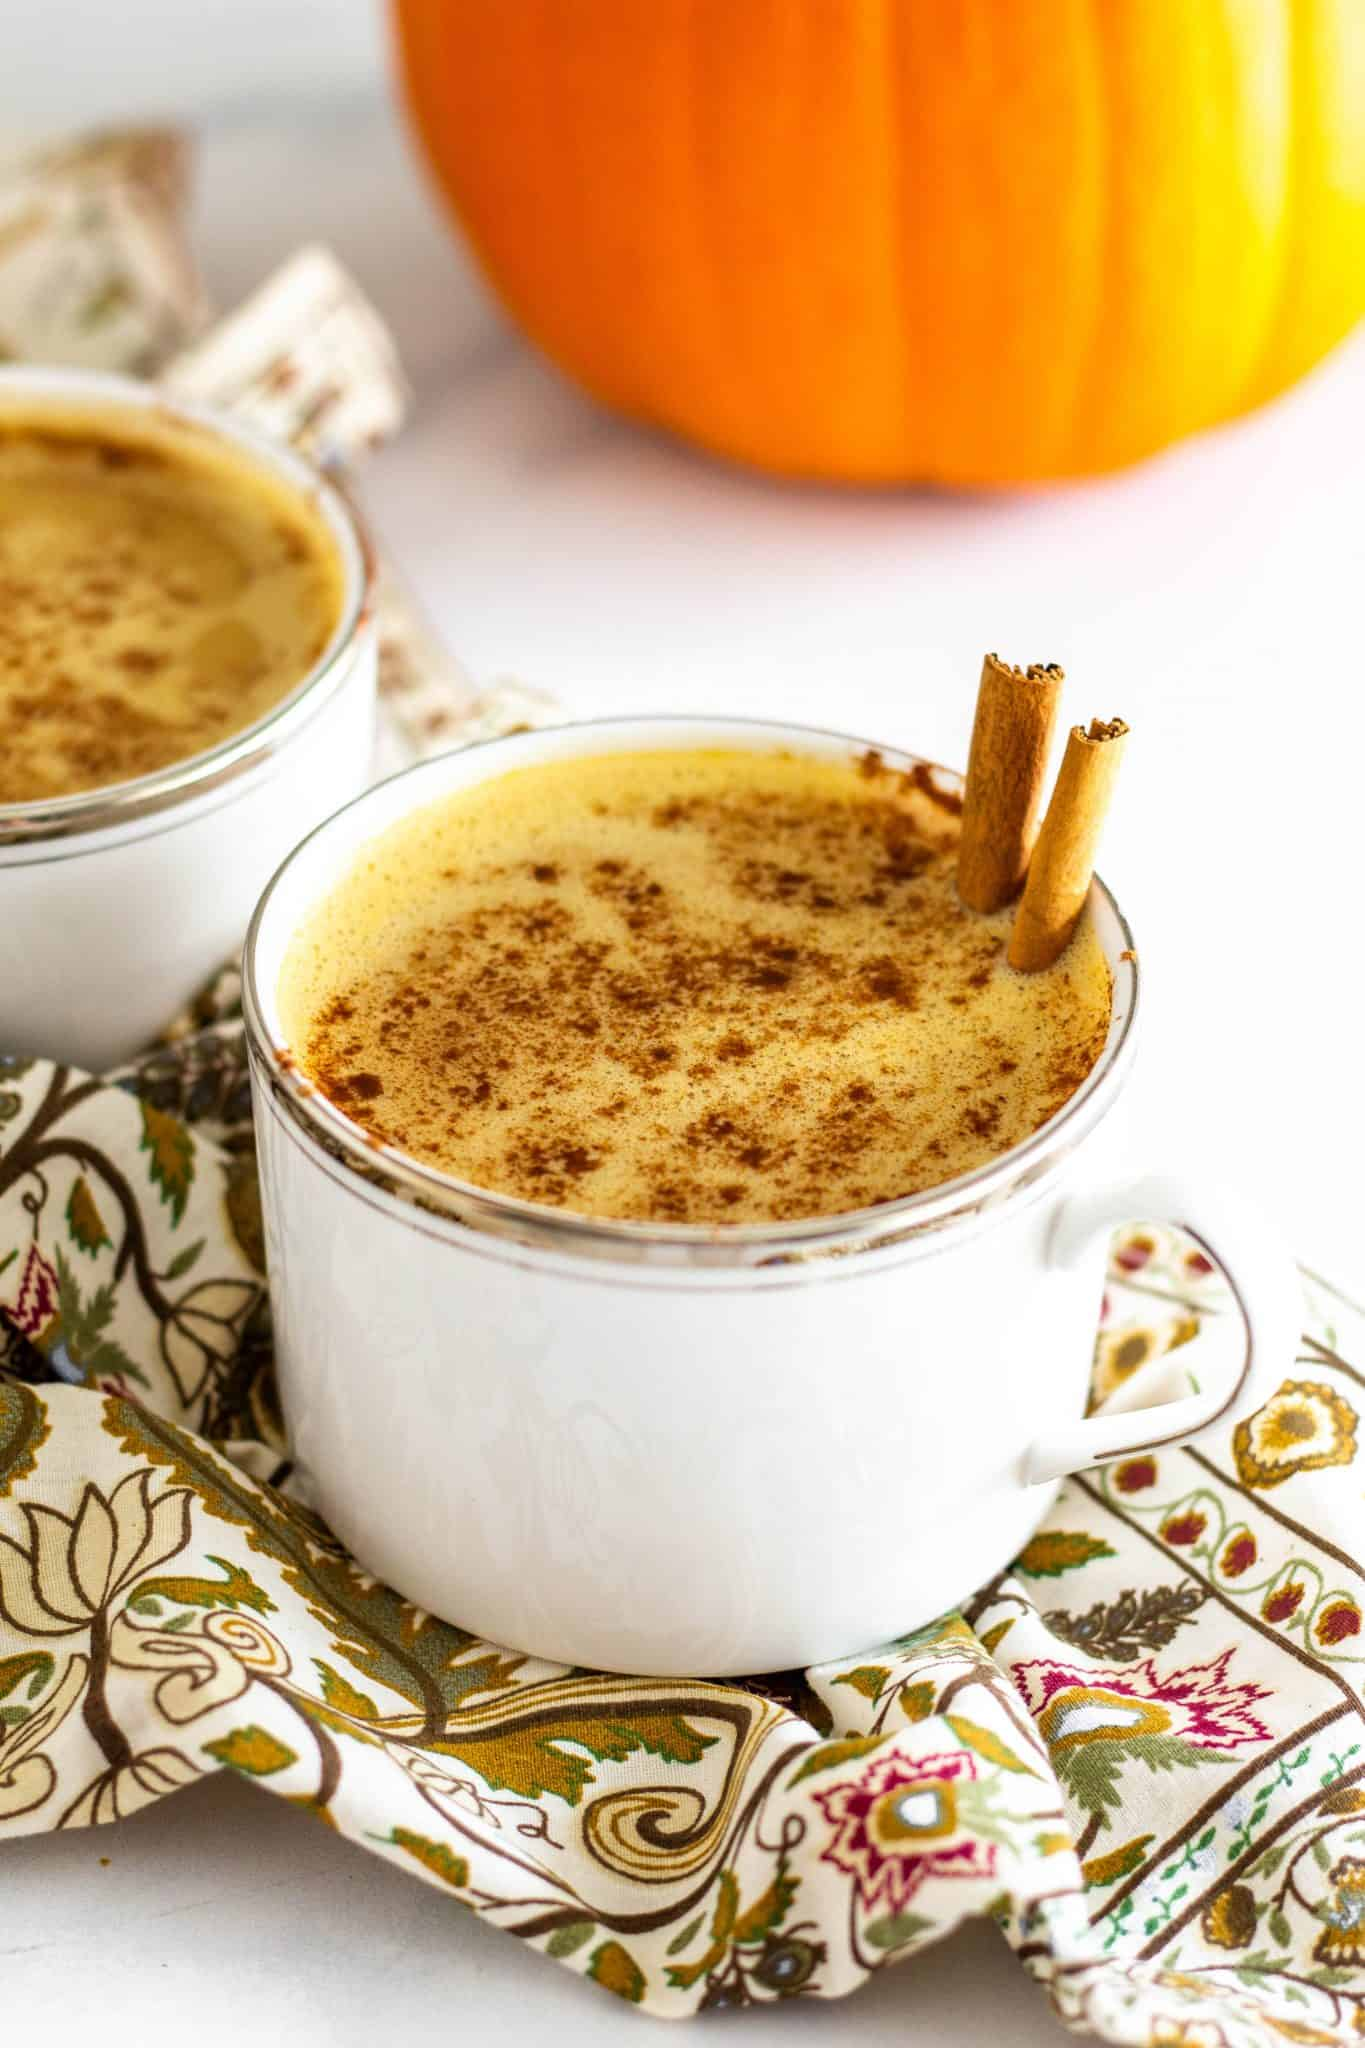 Healthy Pumpkin Spice Latte with Oat Milk #dairyfree #pumpkinlatte